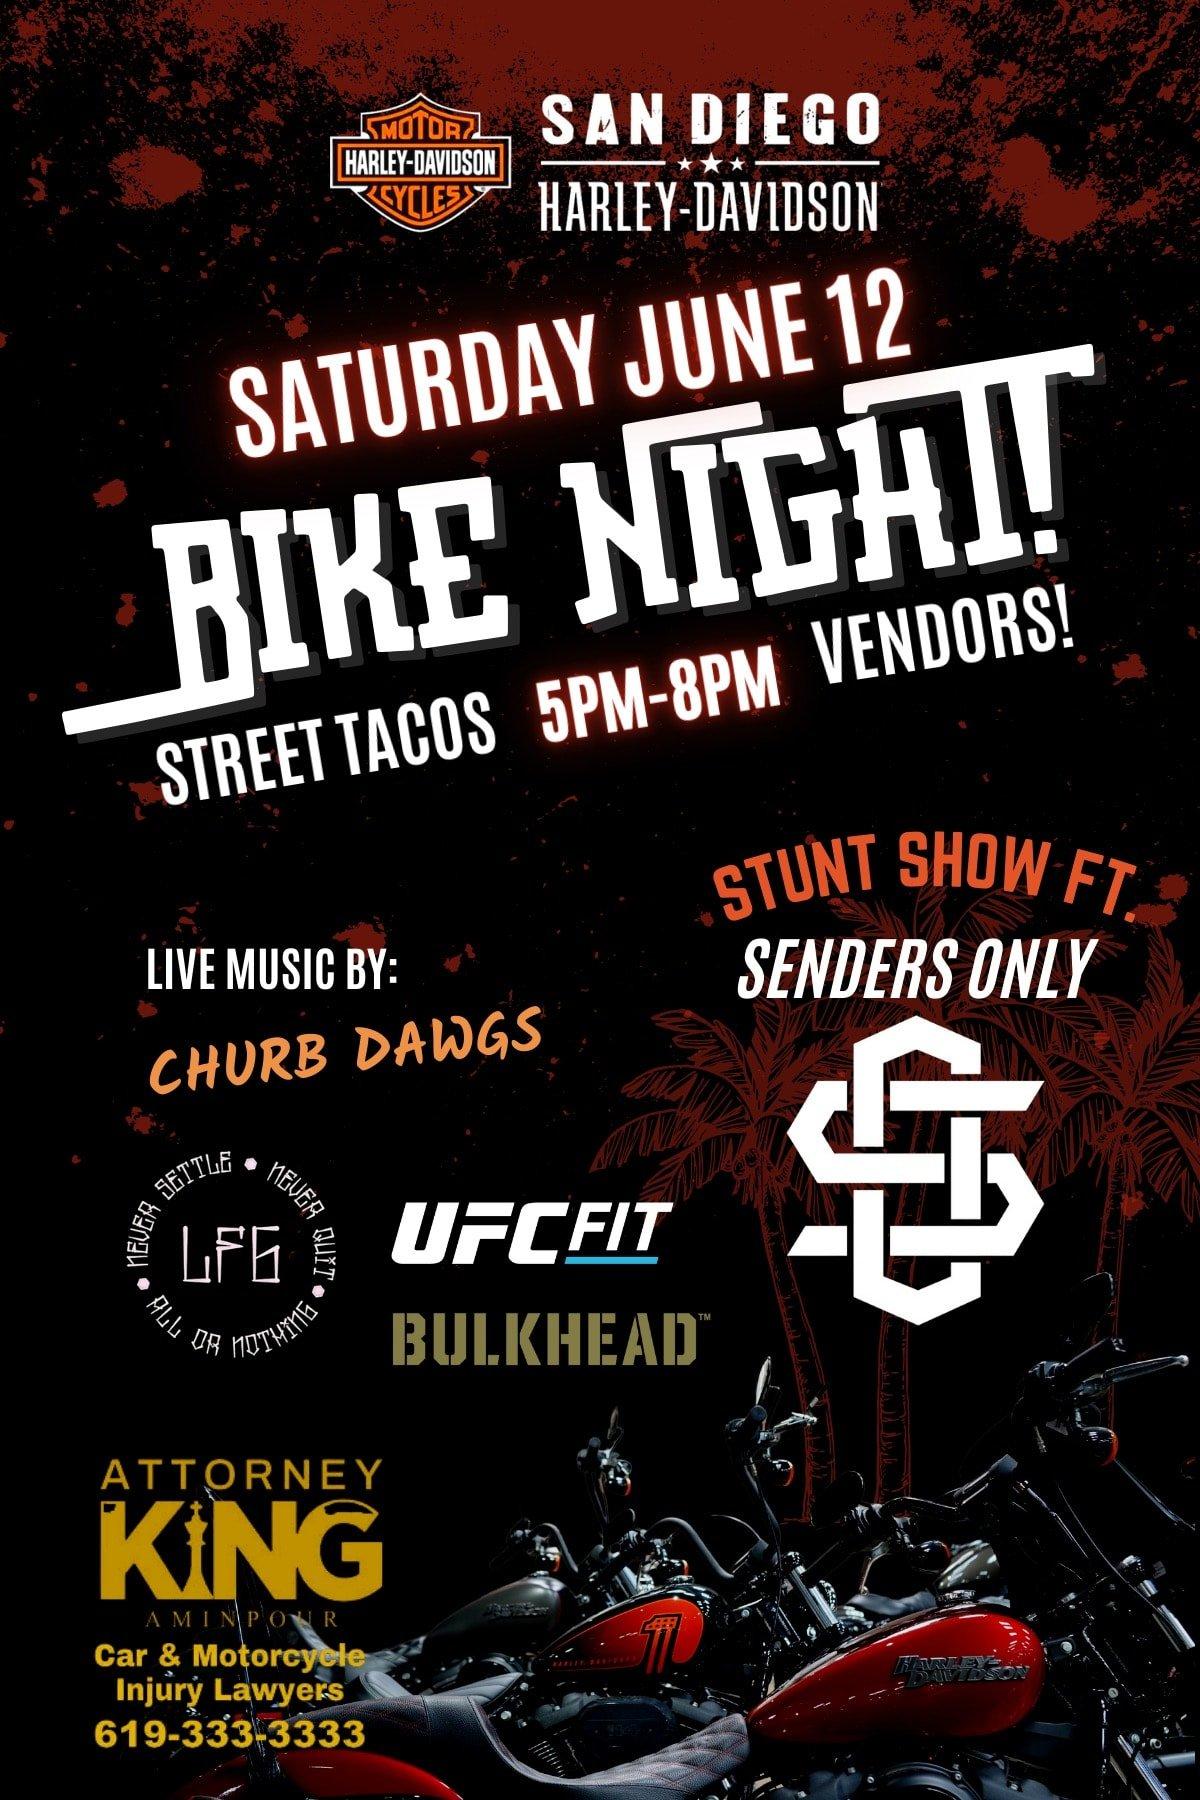 Bike Night at SD Harley